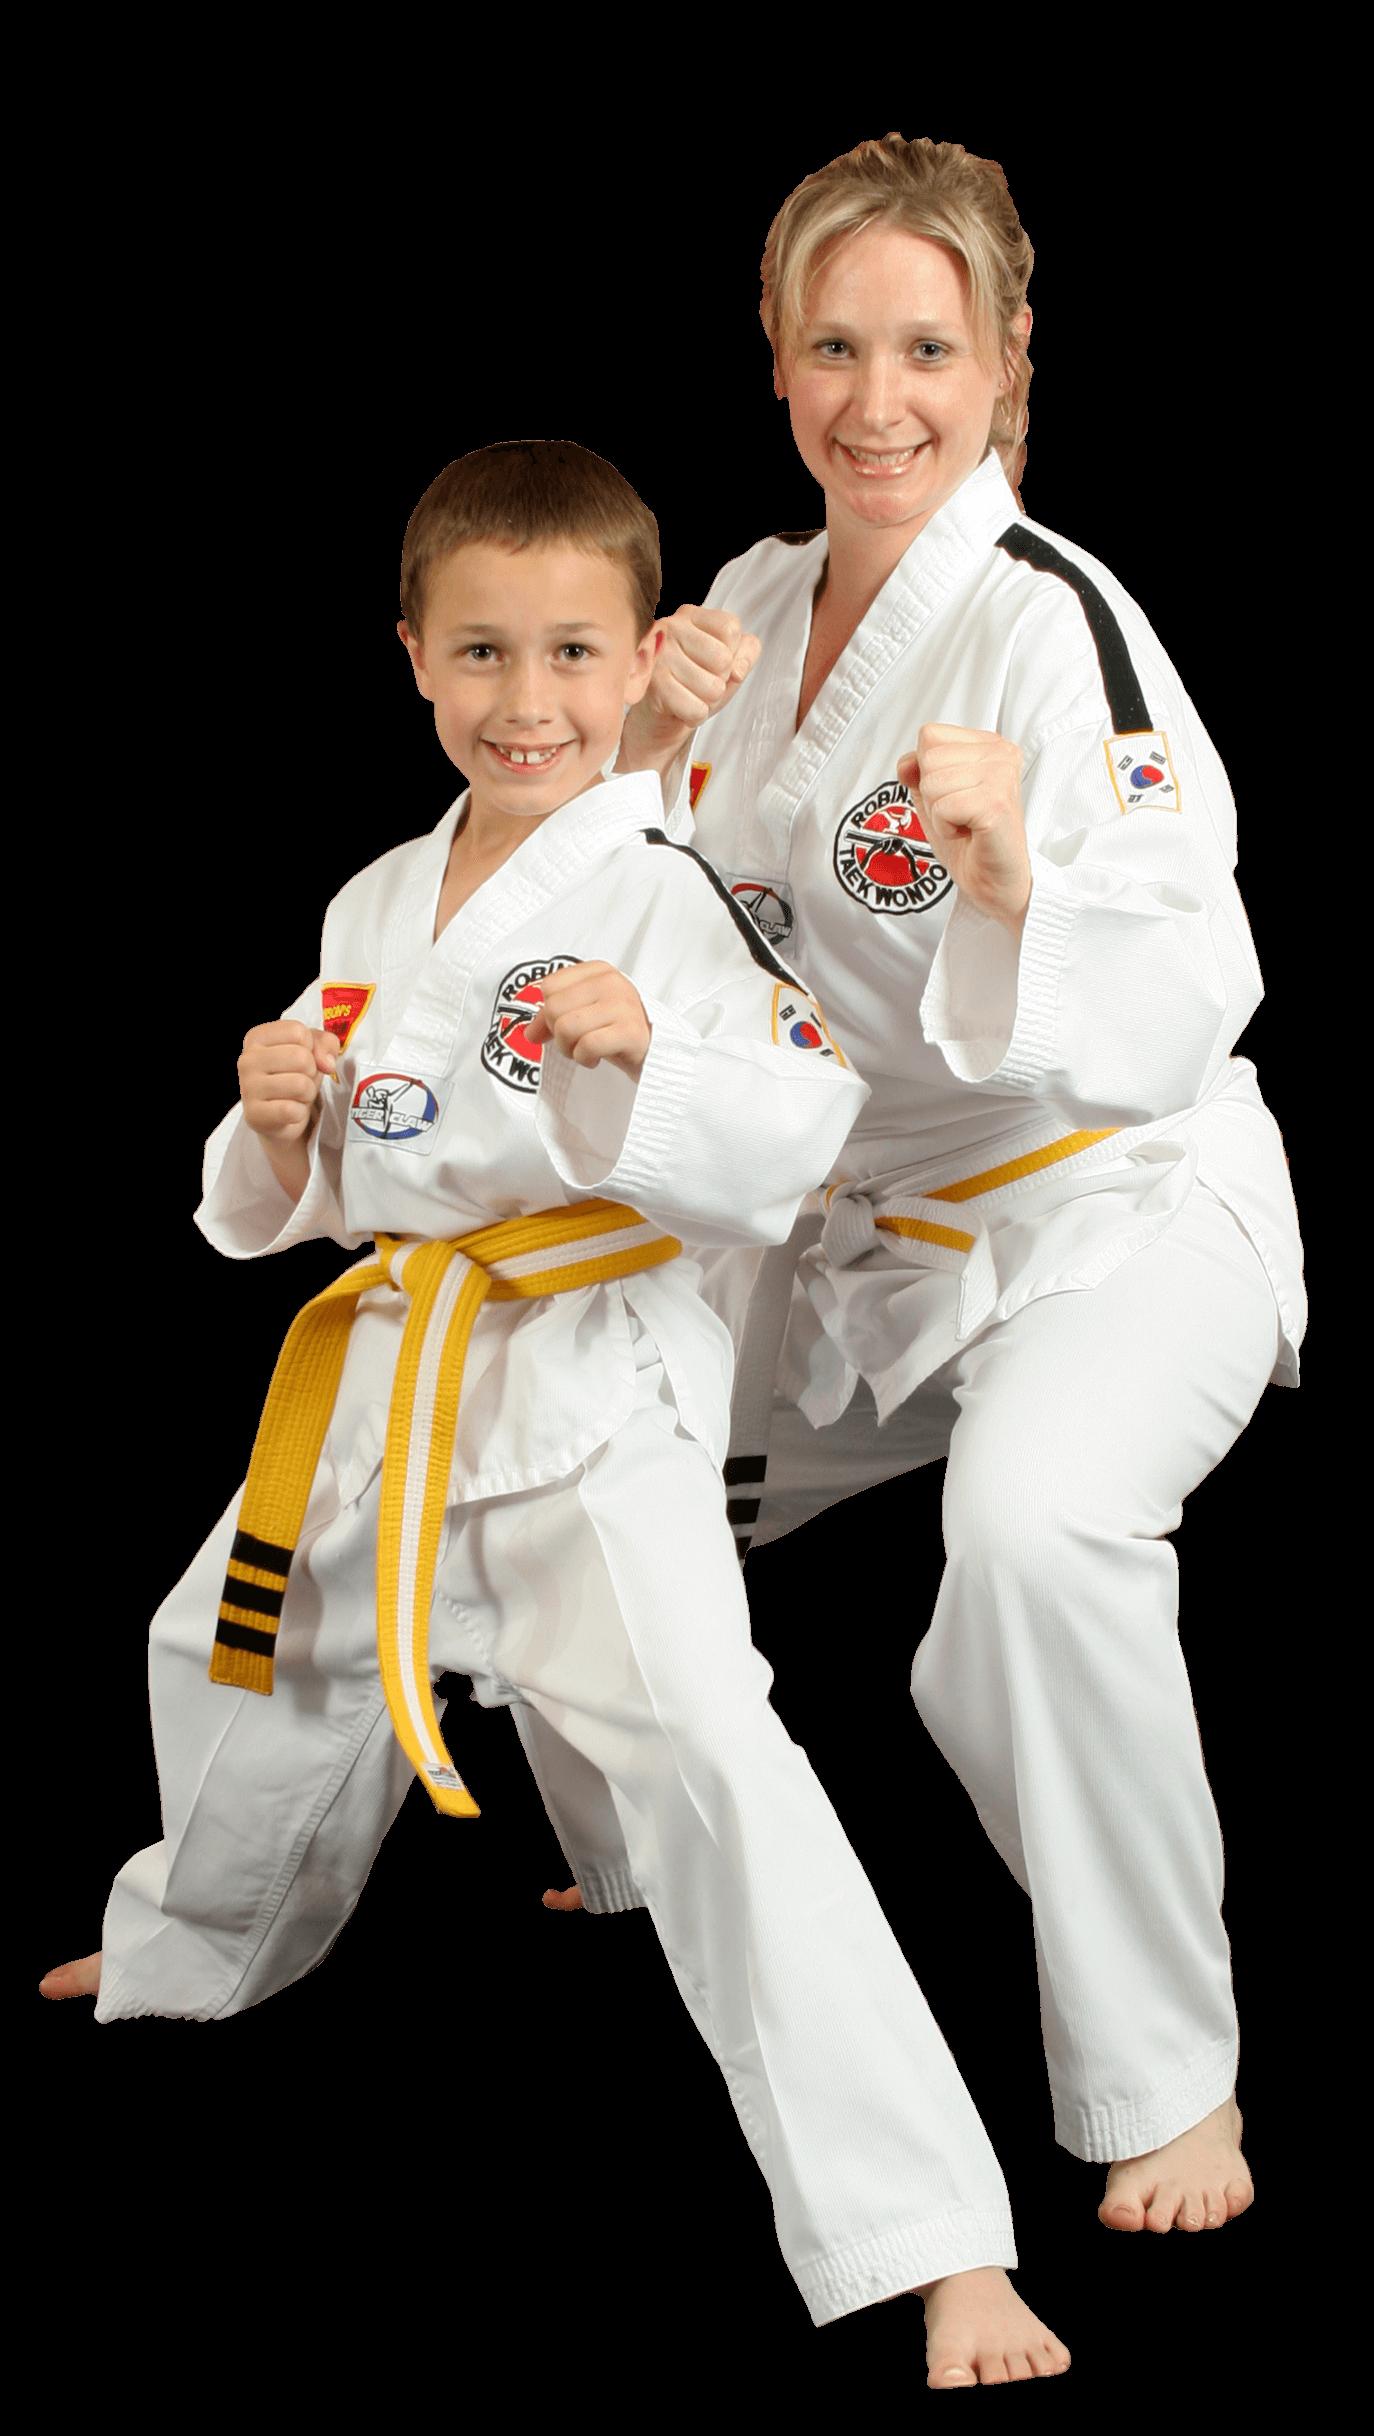 Robinson's Taekwondo family programs